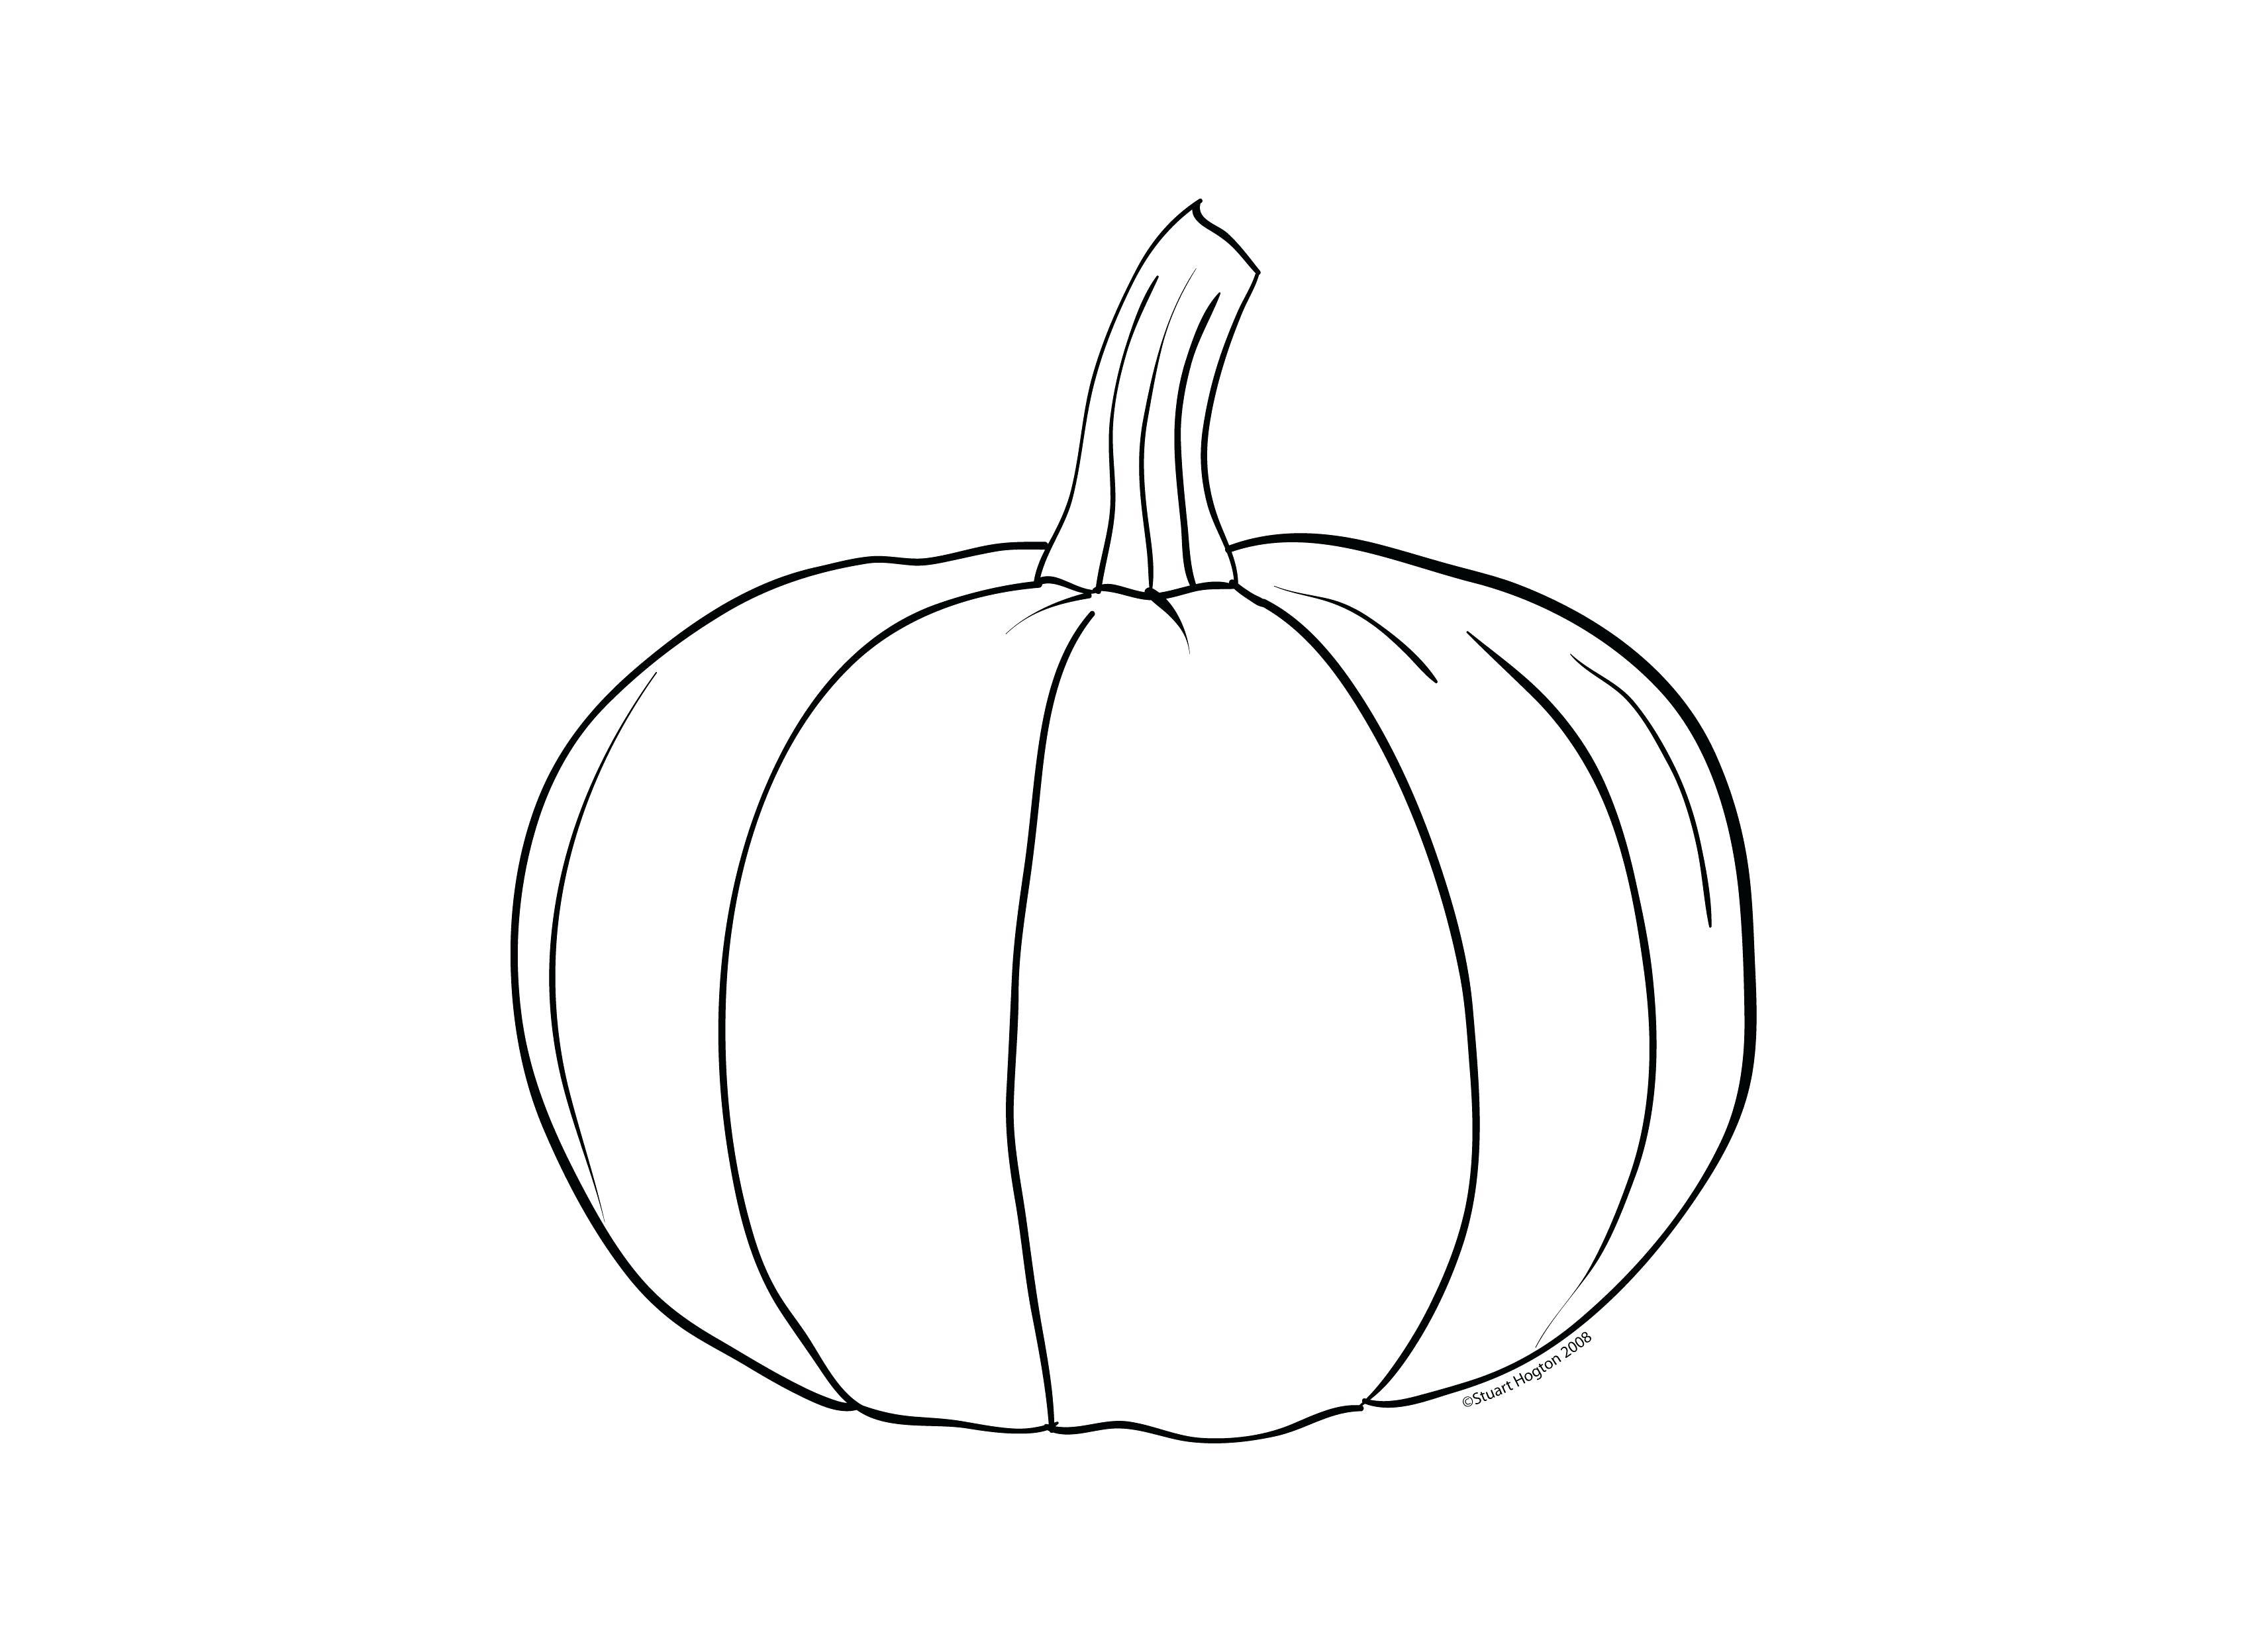 Coloring Page Of Pumpkin Pumpkin Coloring Page Printable Niagarapaperco